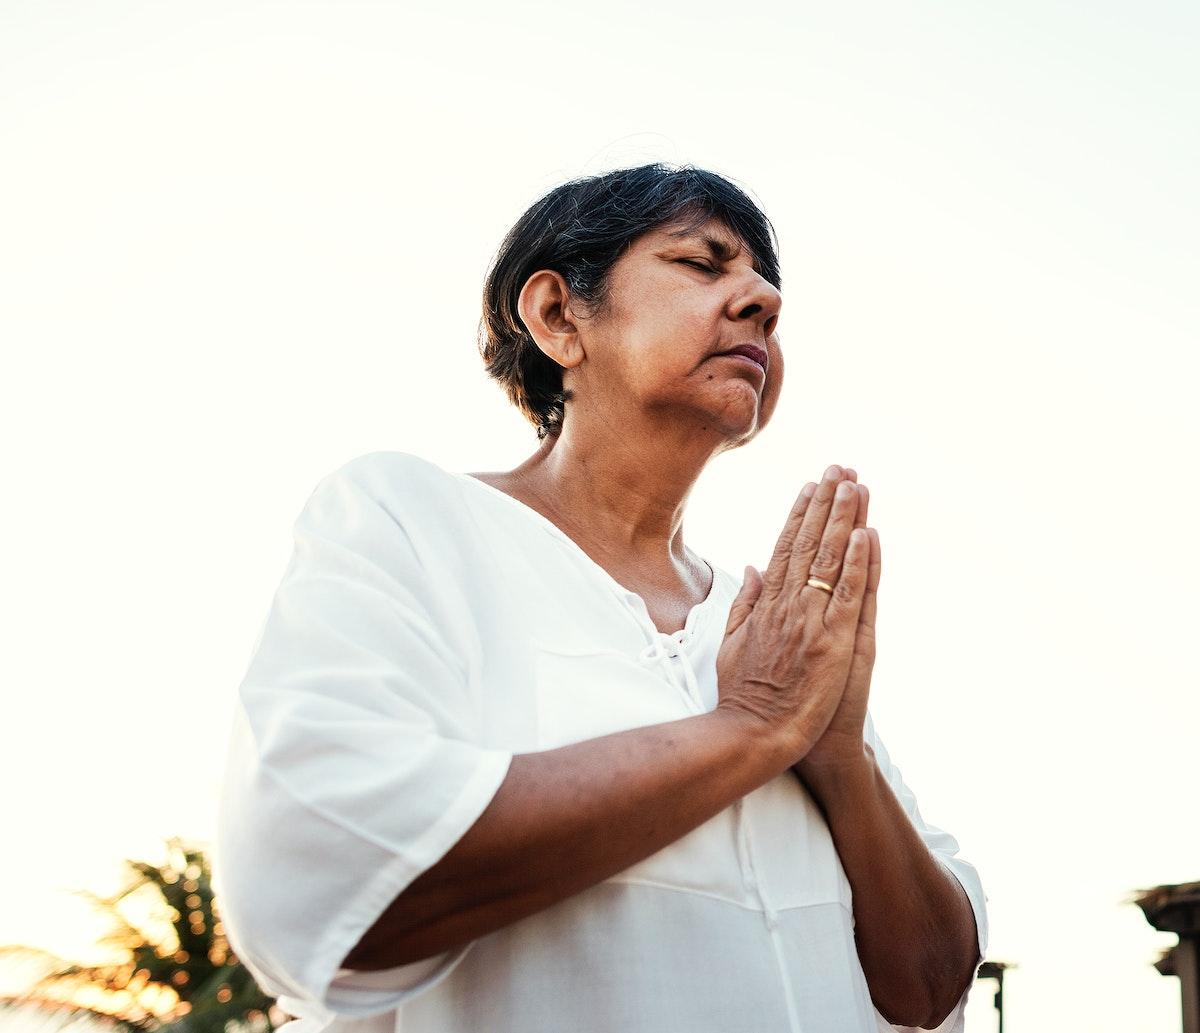 Senior adult practicing yoga outdoors